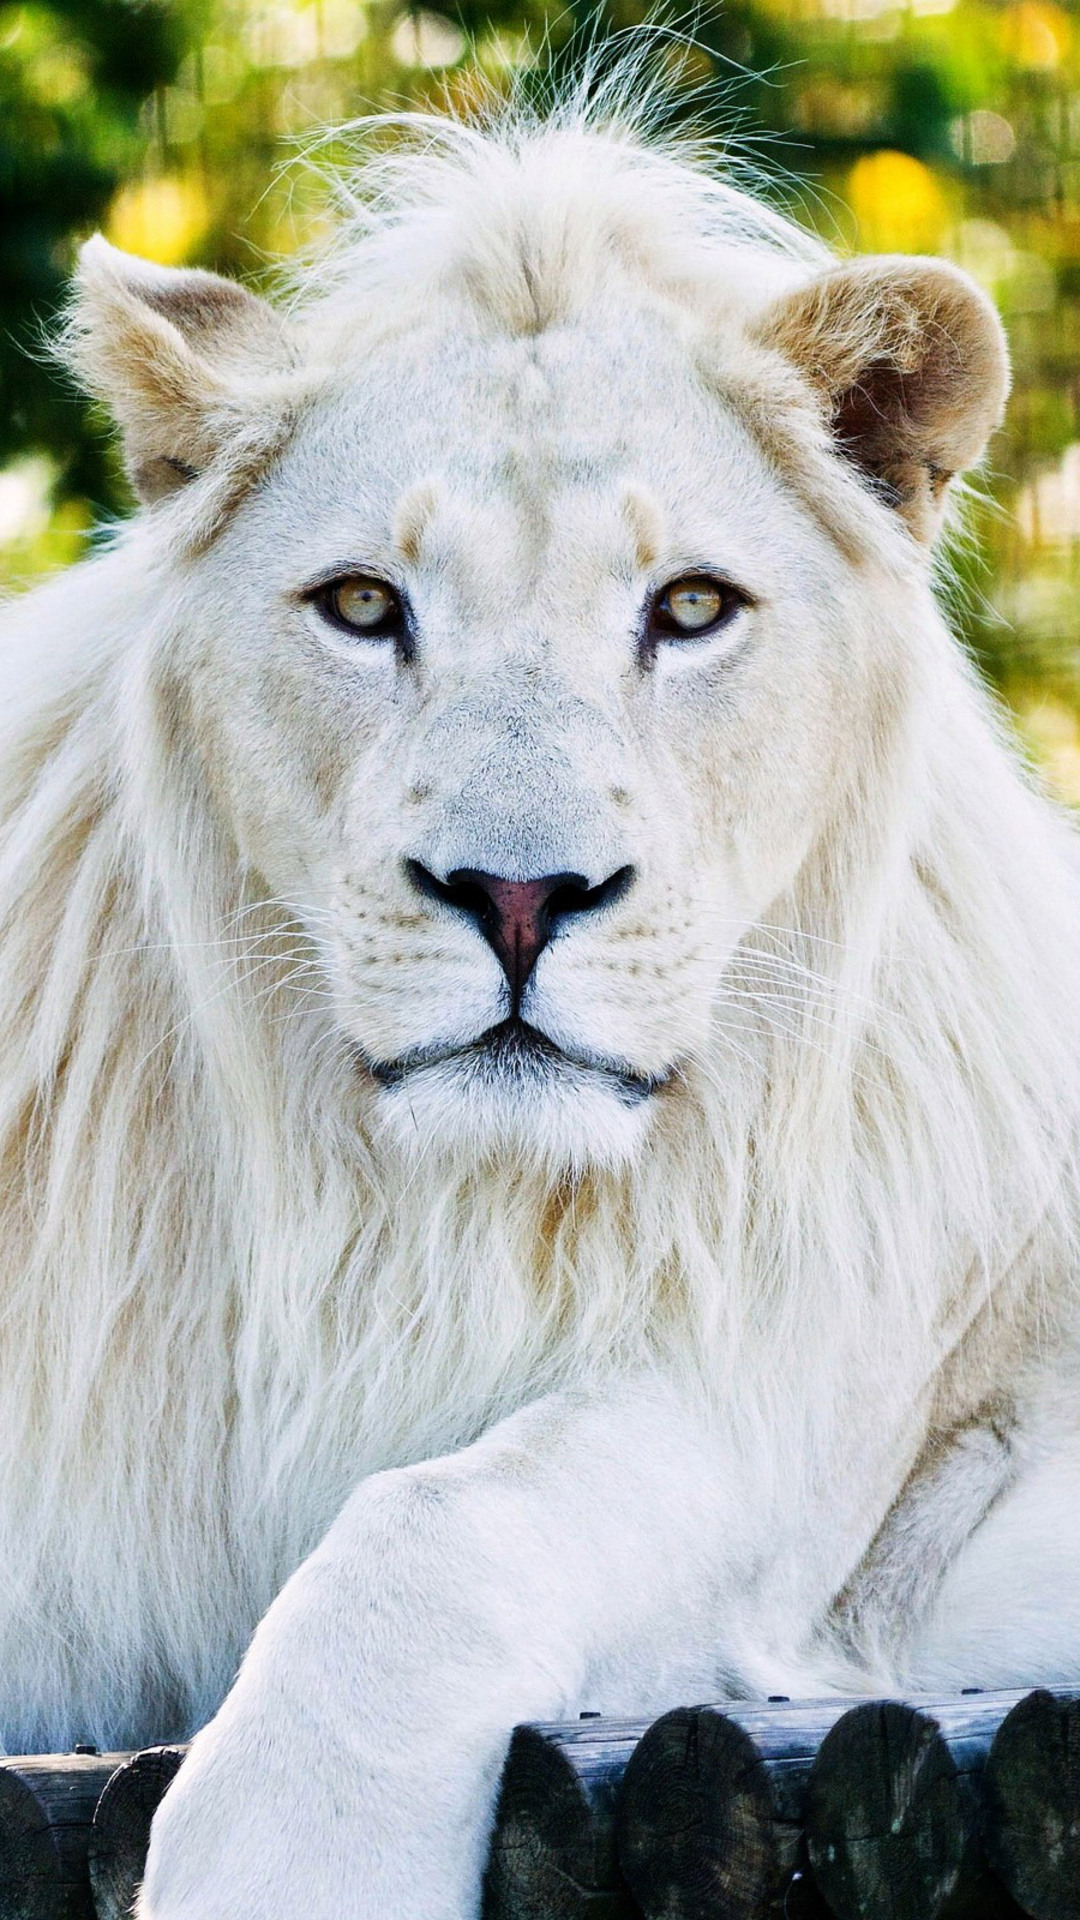 1080x1920 White Lion Iphone 7 6s 6 Plus Pixel Xl One Plus 3 3t 5